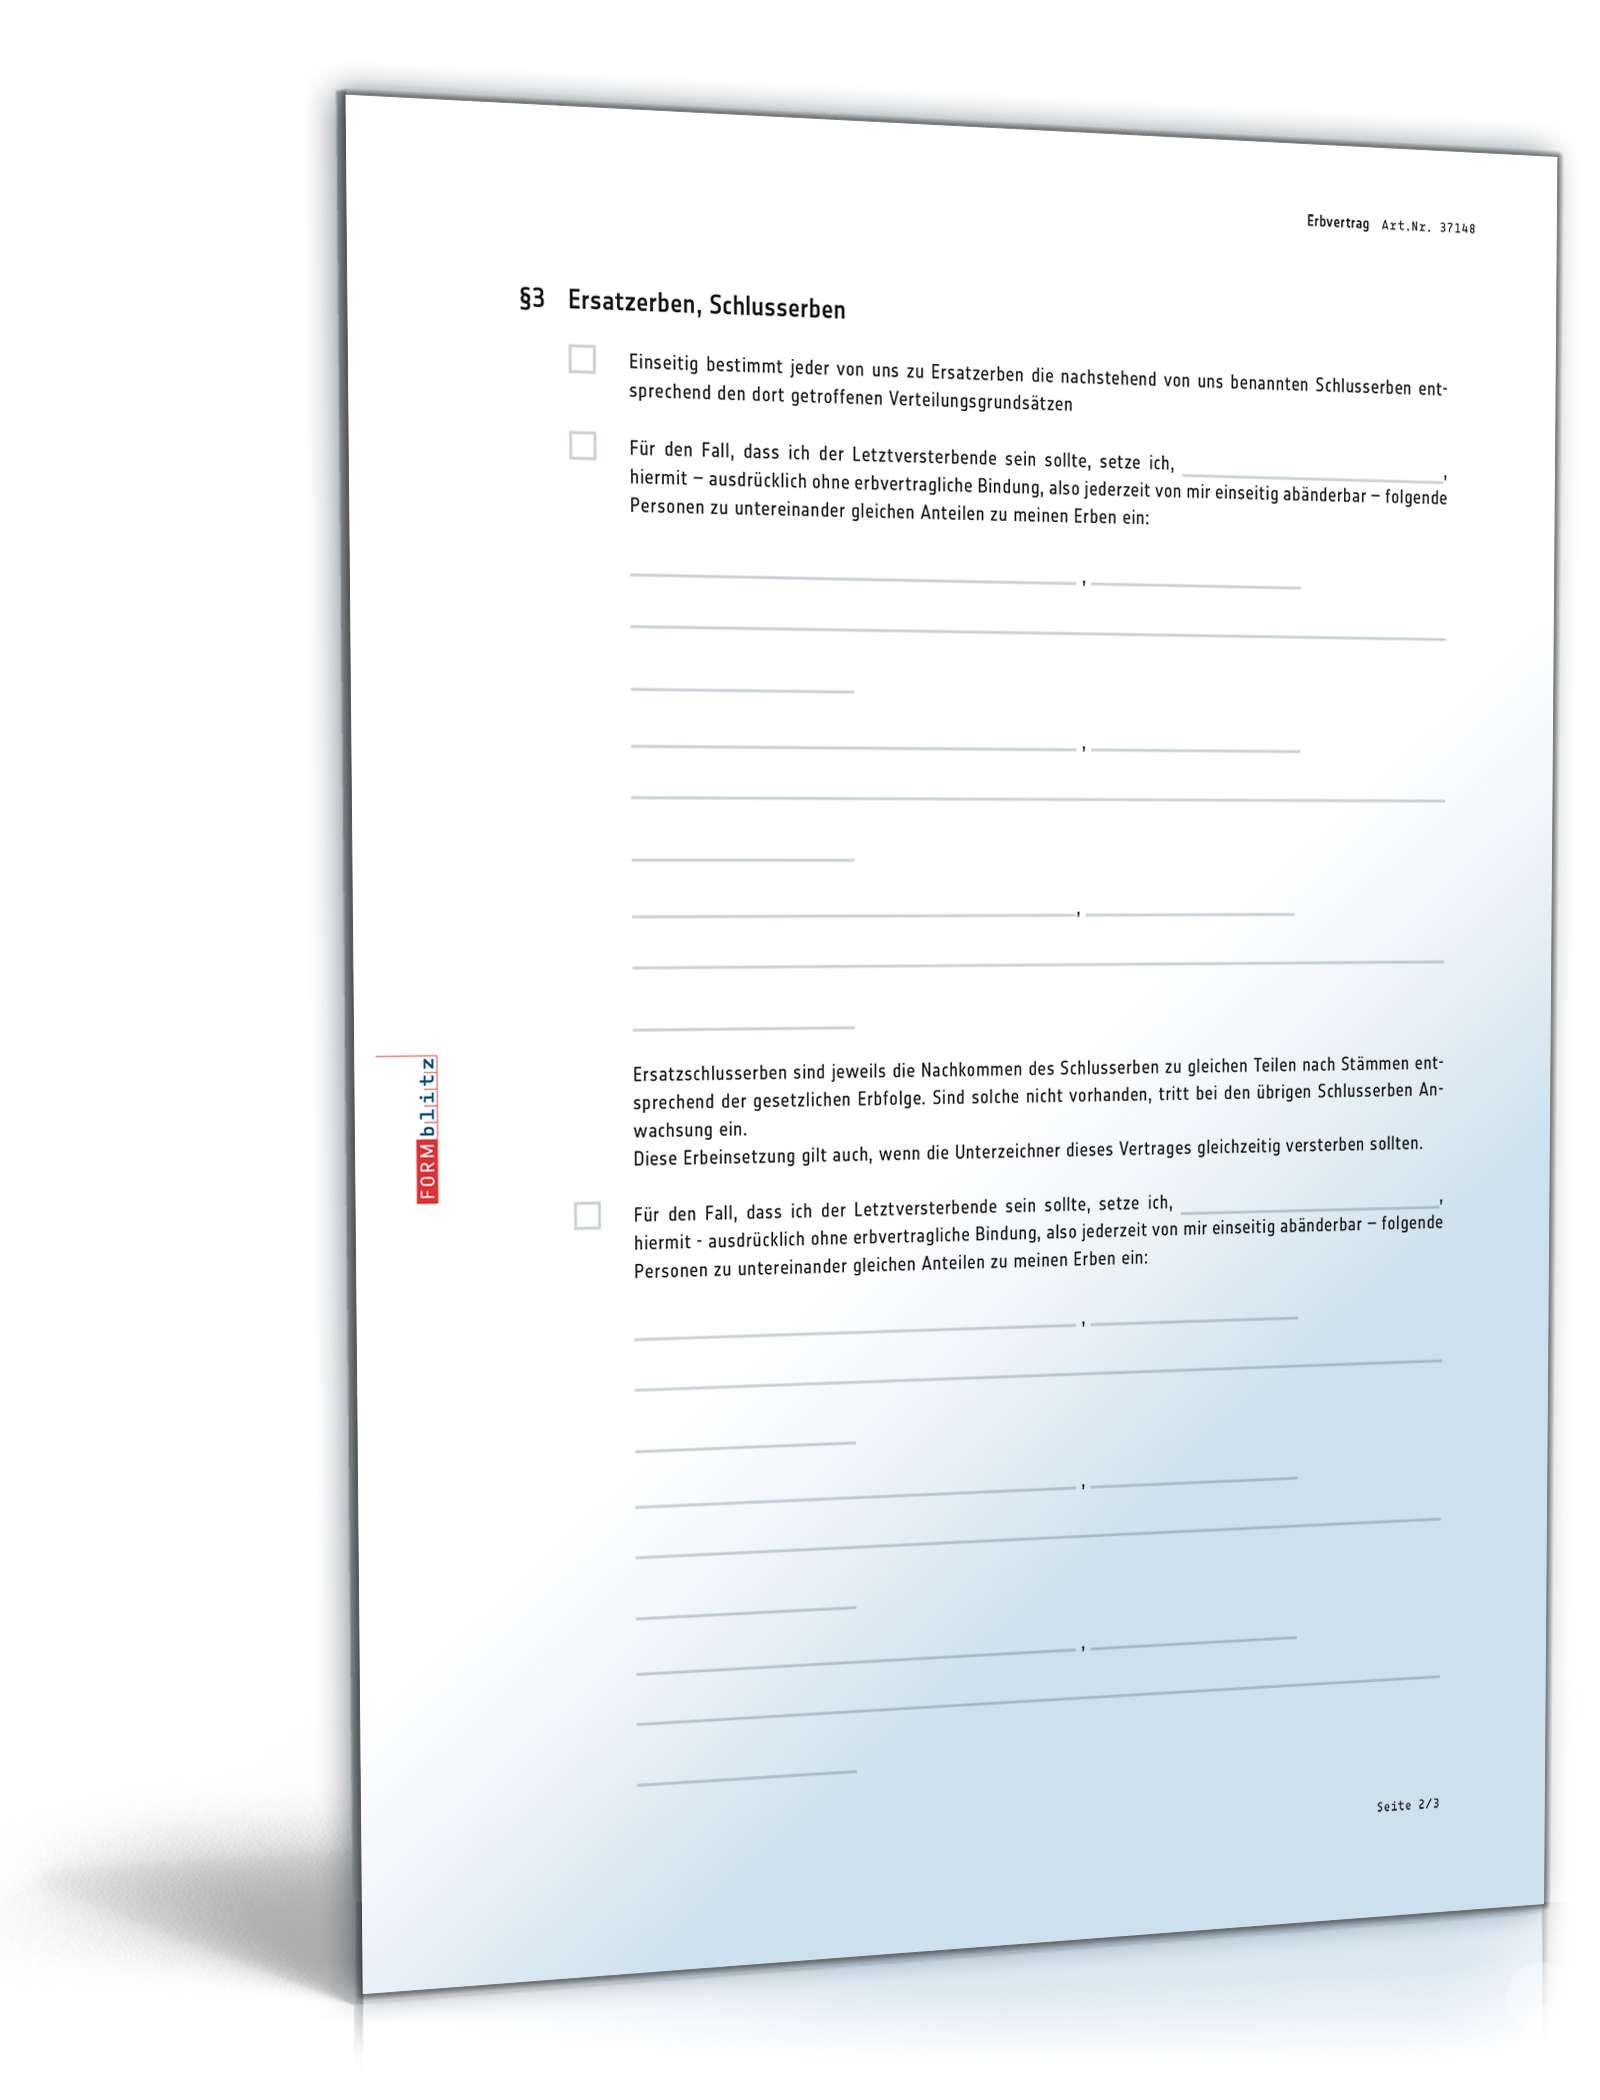 pdf seite 2 - Erbvertrag Muster